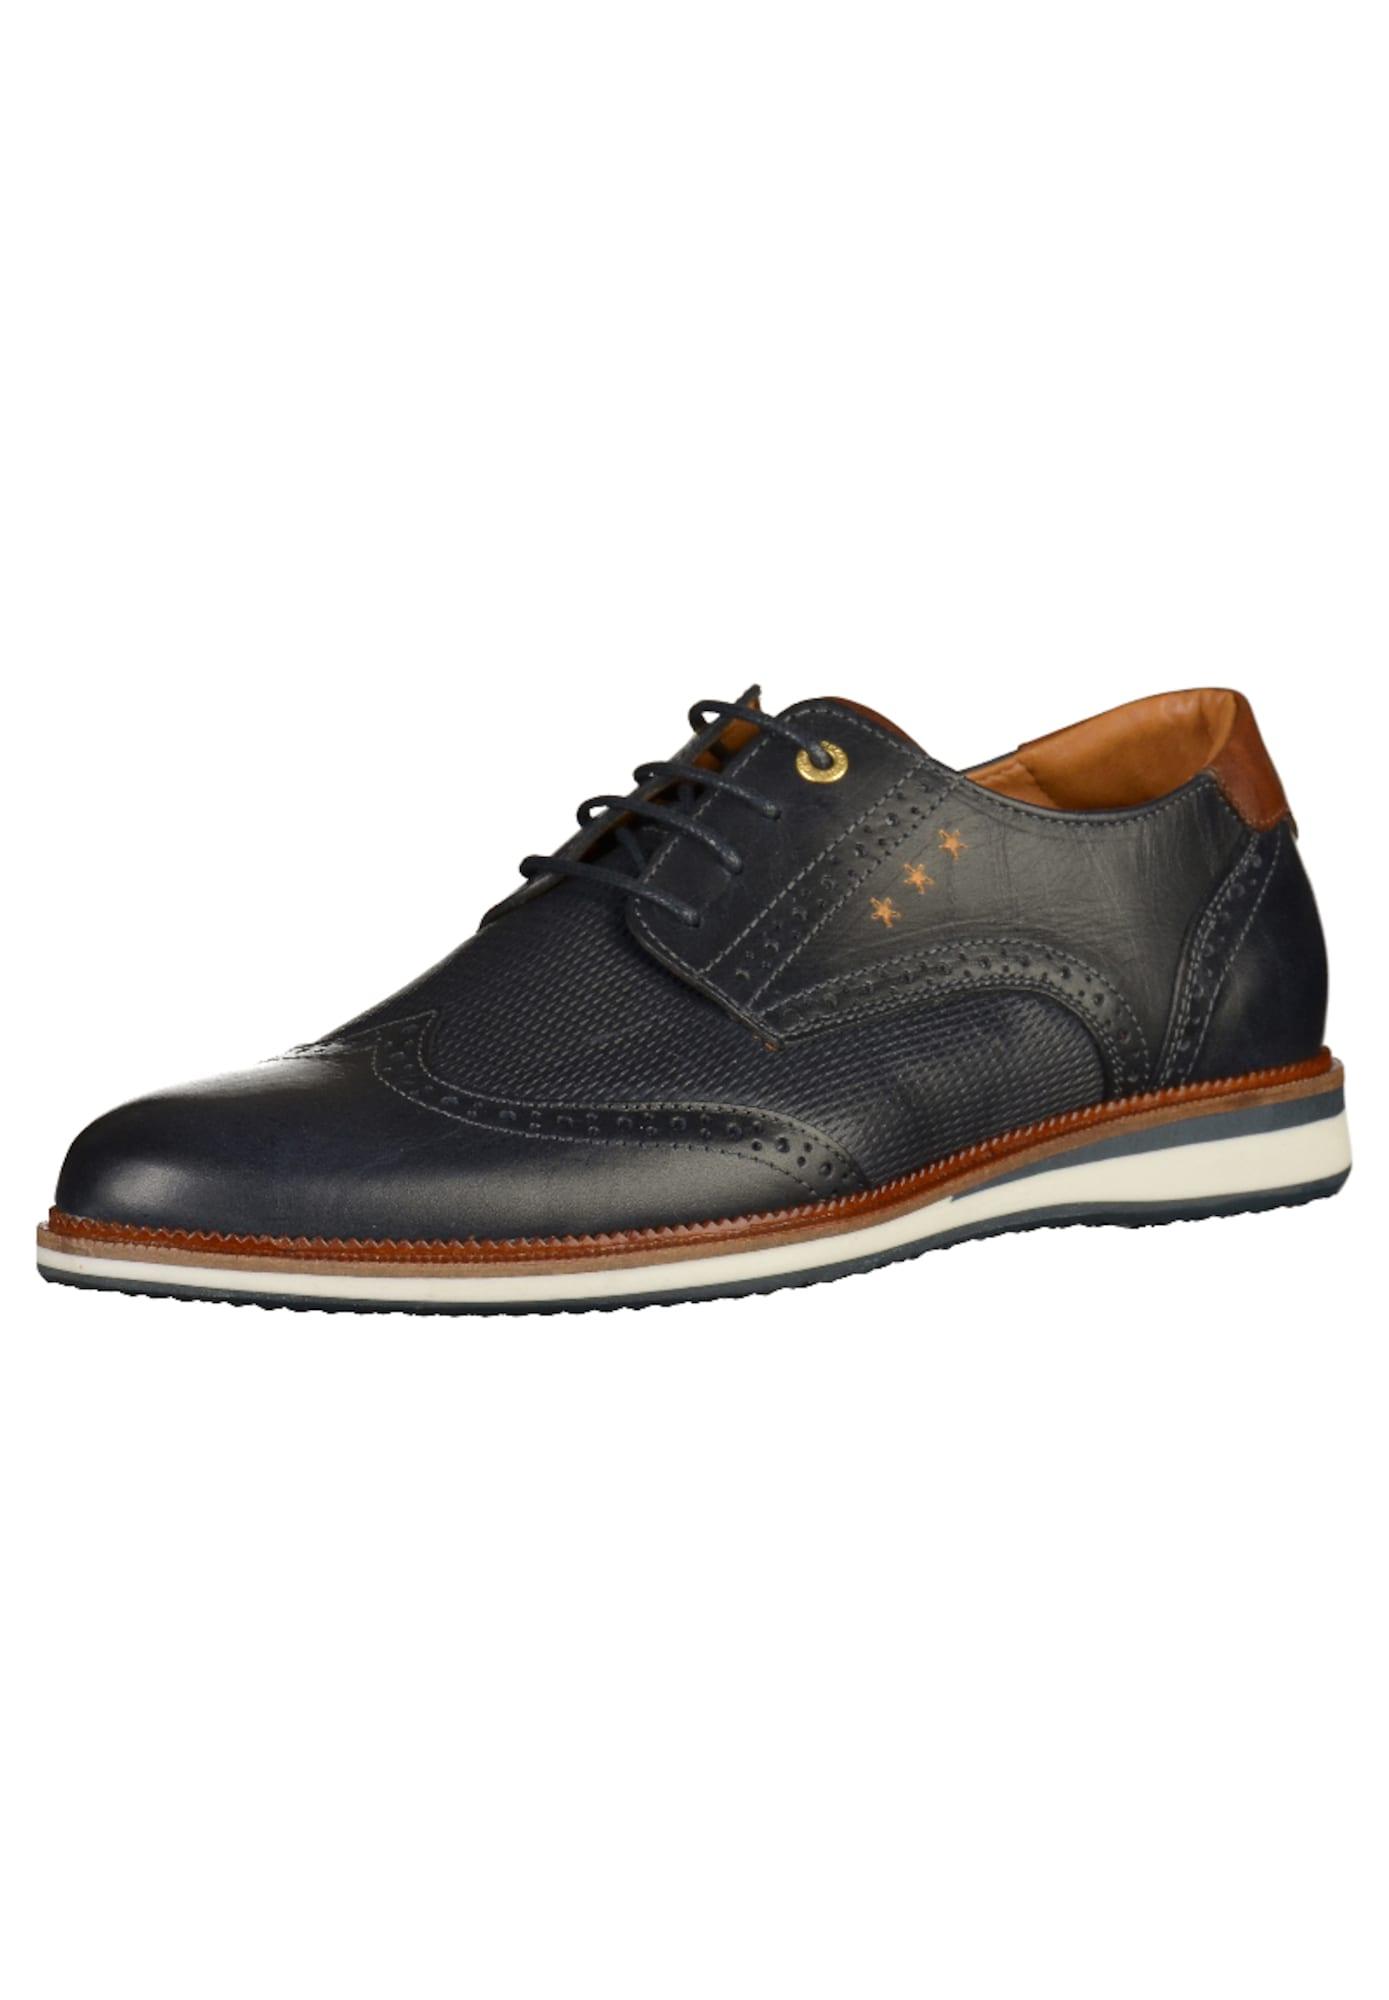 Halbschuhe   Schuhe > Boots   Dunkelblau - Braun - Gold - Weiß   PANTOFOLA D'ORO